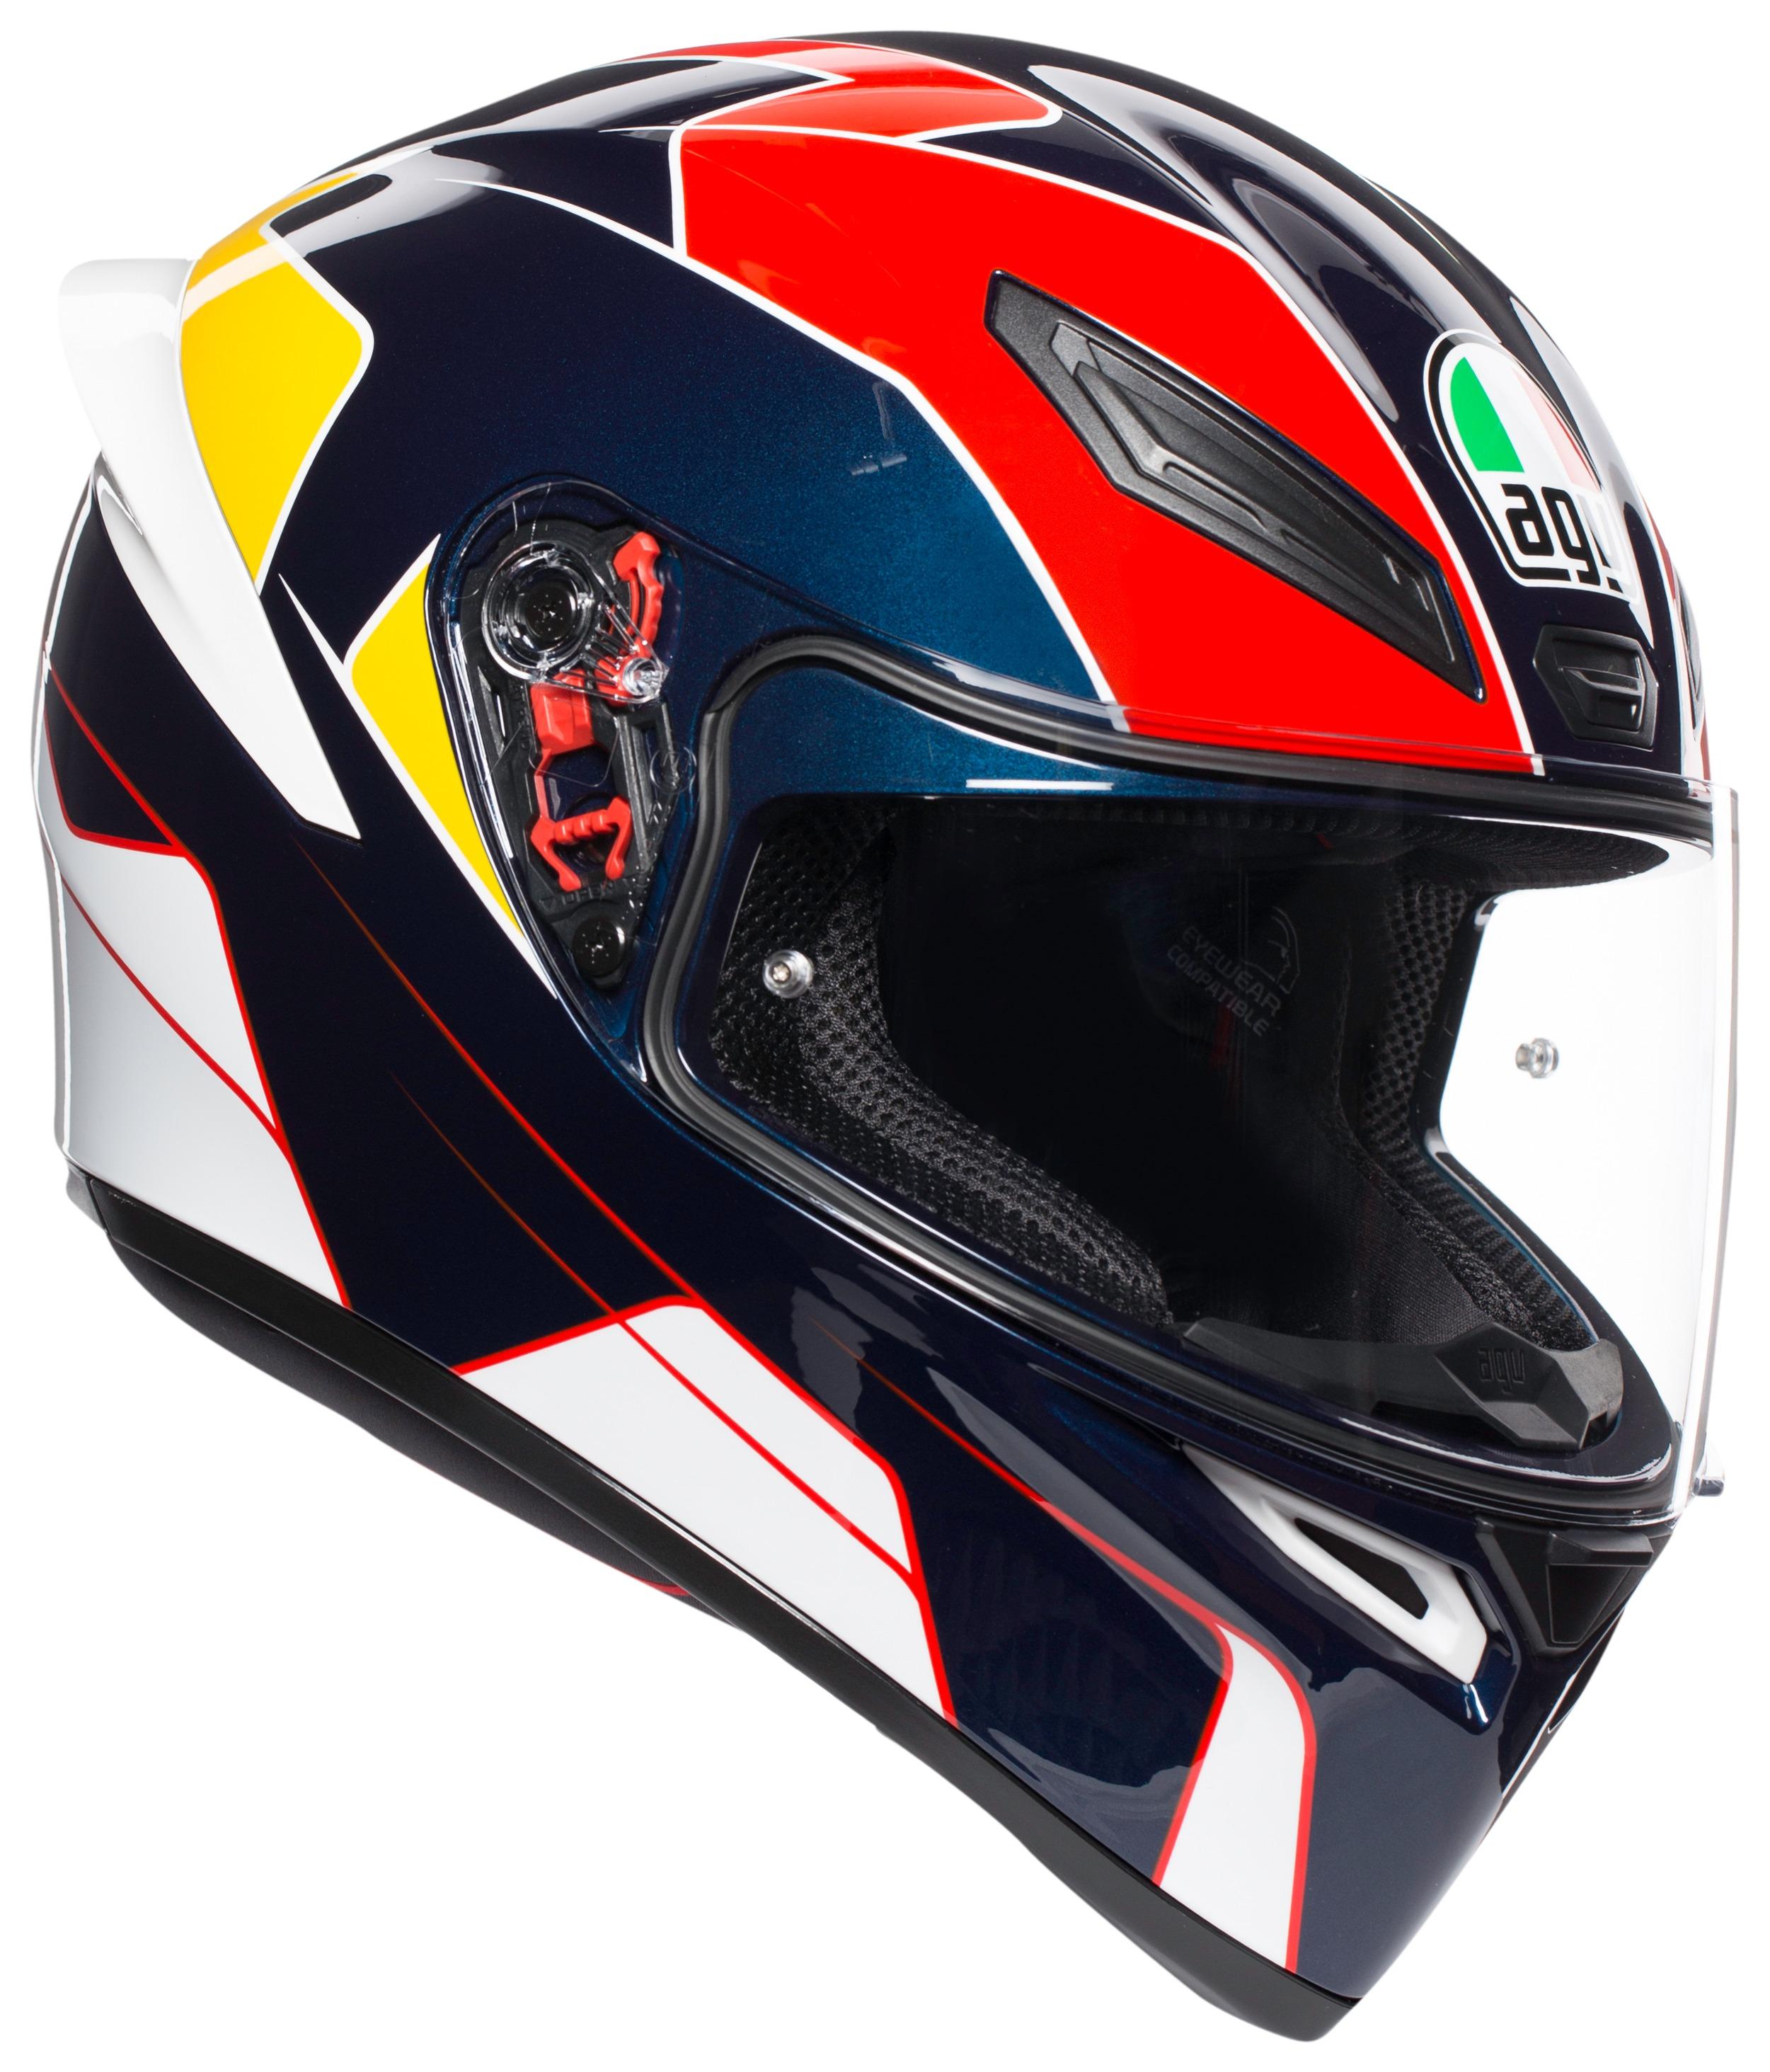 Agv K1 Pitlane Helmet 17 40 00 Off Revzilla